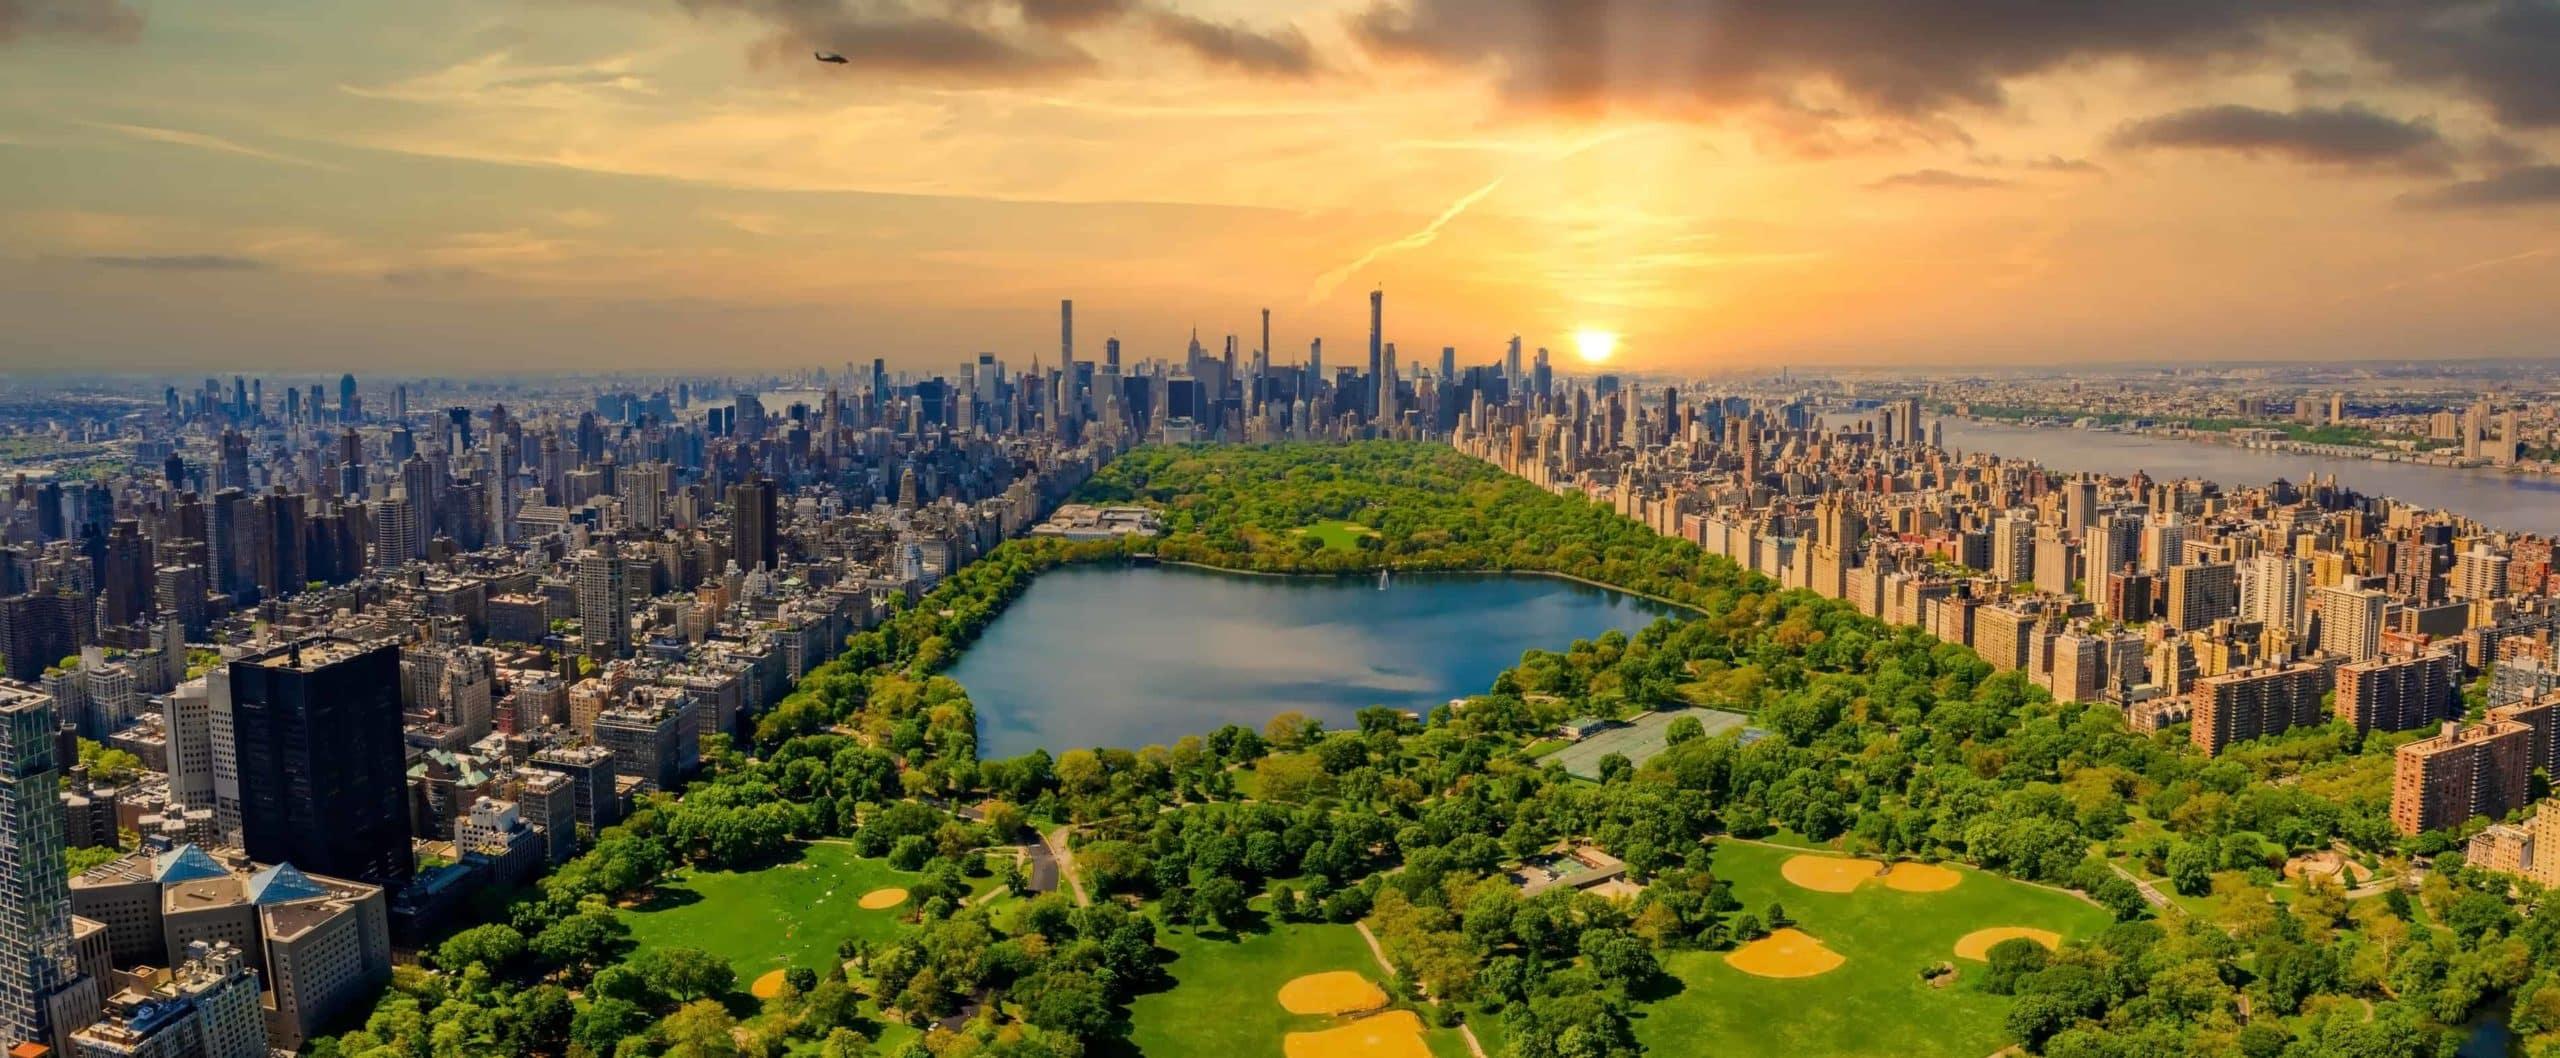 Central Park Big View